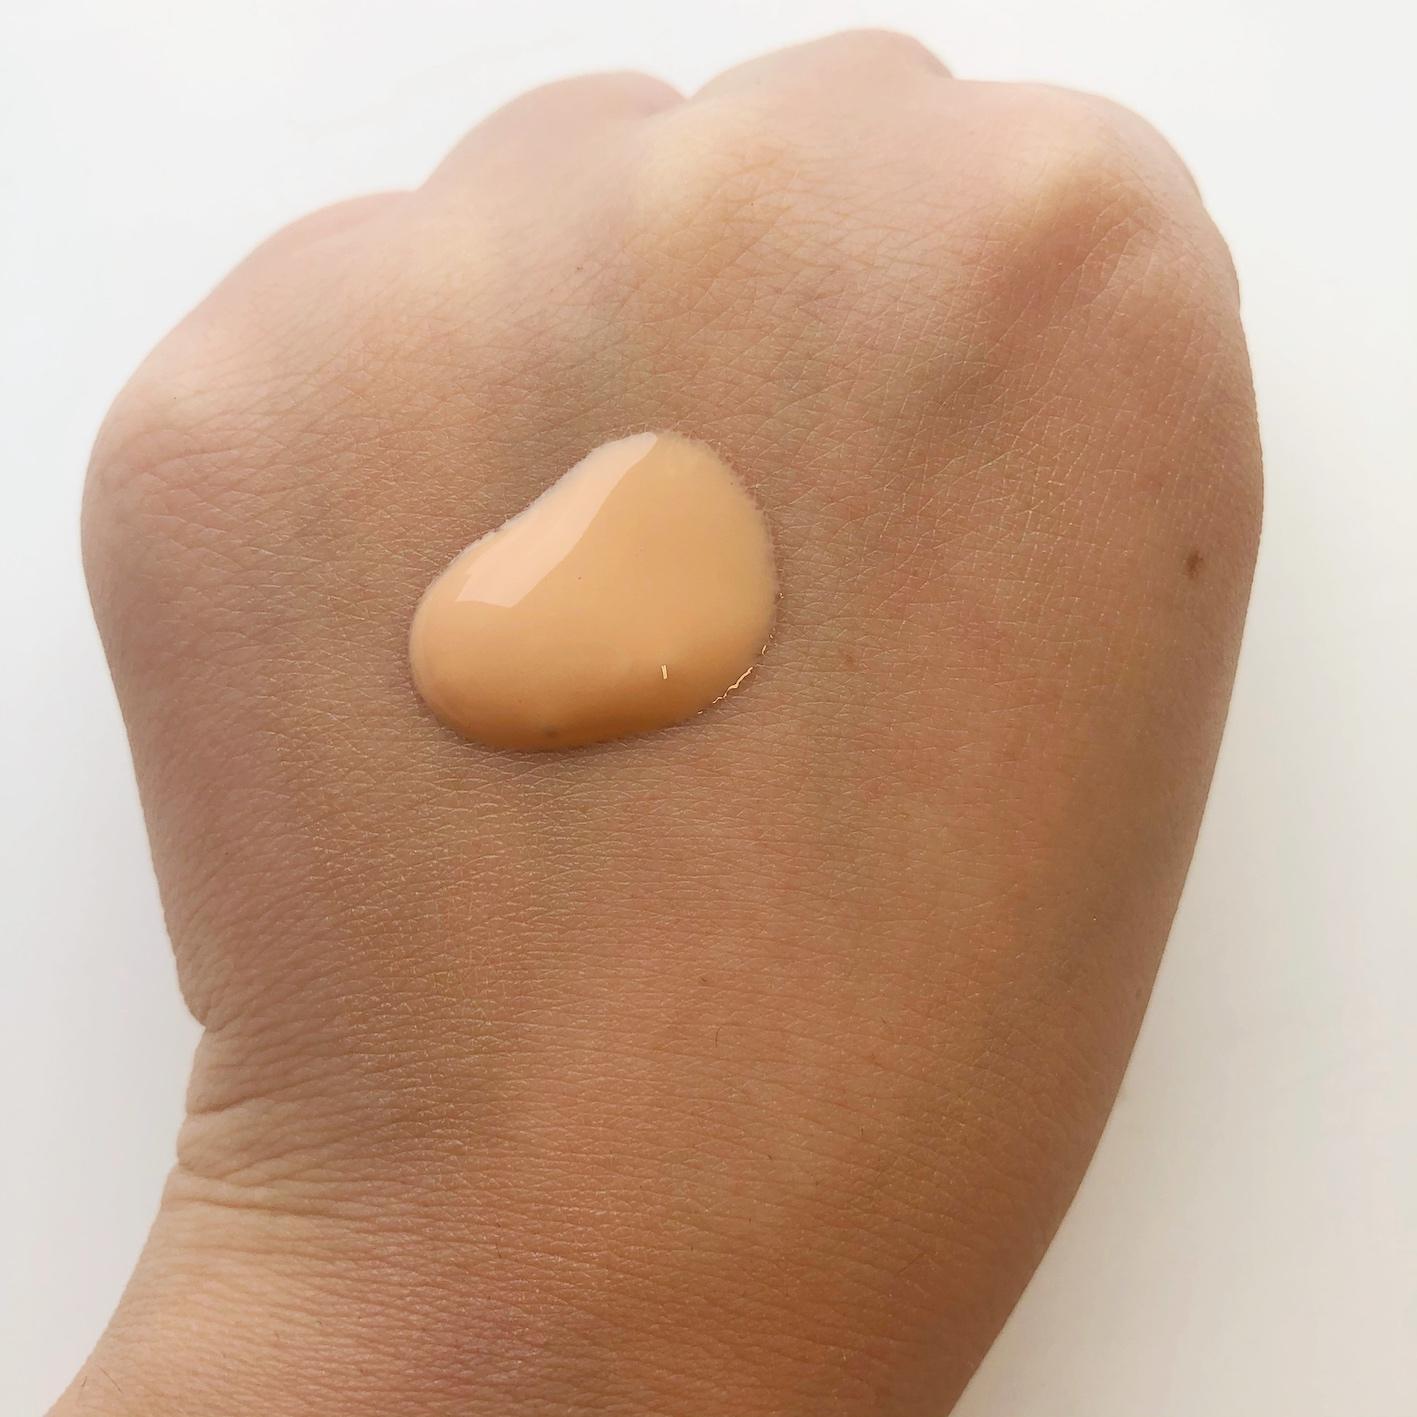 THREE アドバンスドハーモニープライマー コンフィデンス 優しく肌を包み込む美容液生まれのプライマーに関する画像10